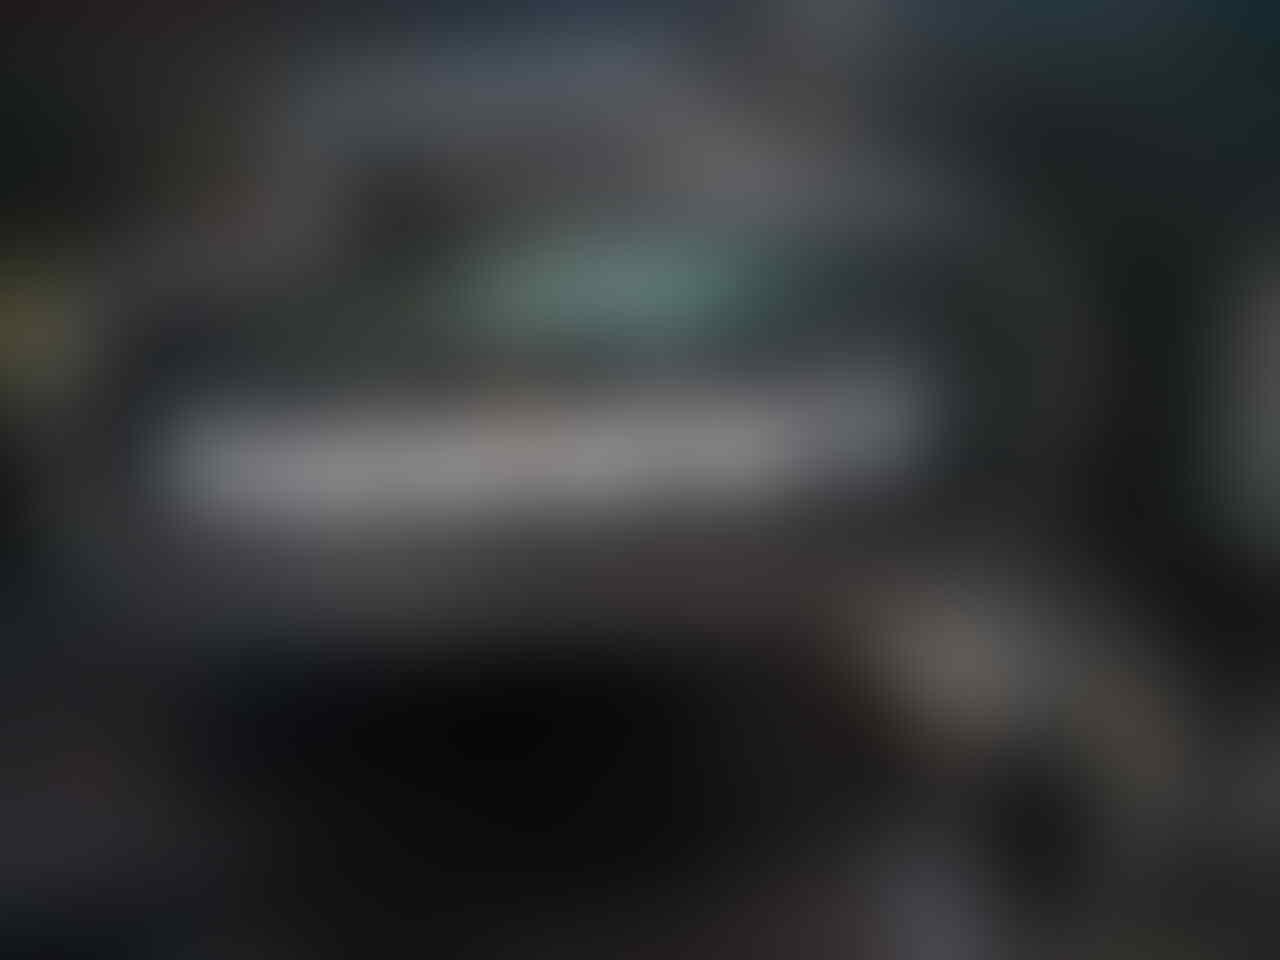 Suzuki SX4 Kaskus Owners Community Indonesia [SKOCI] - Part 1